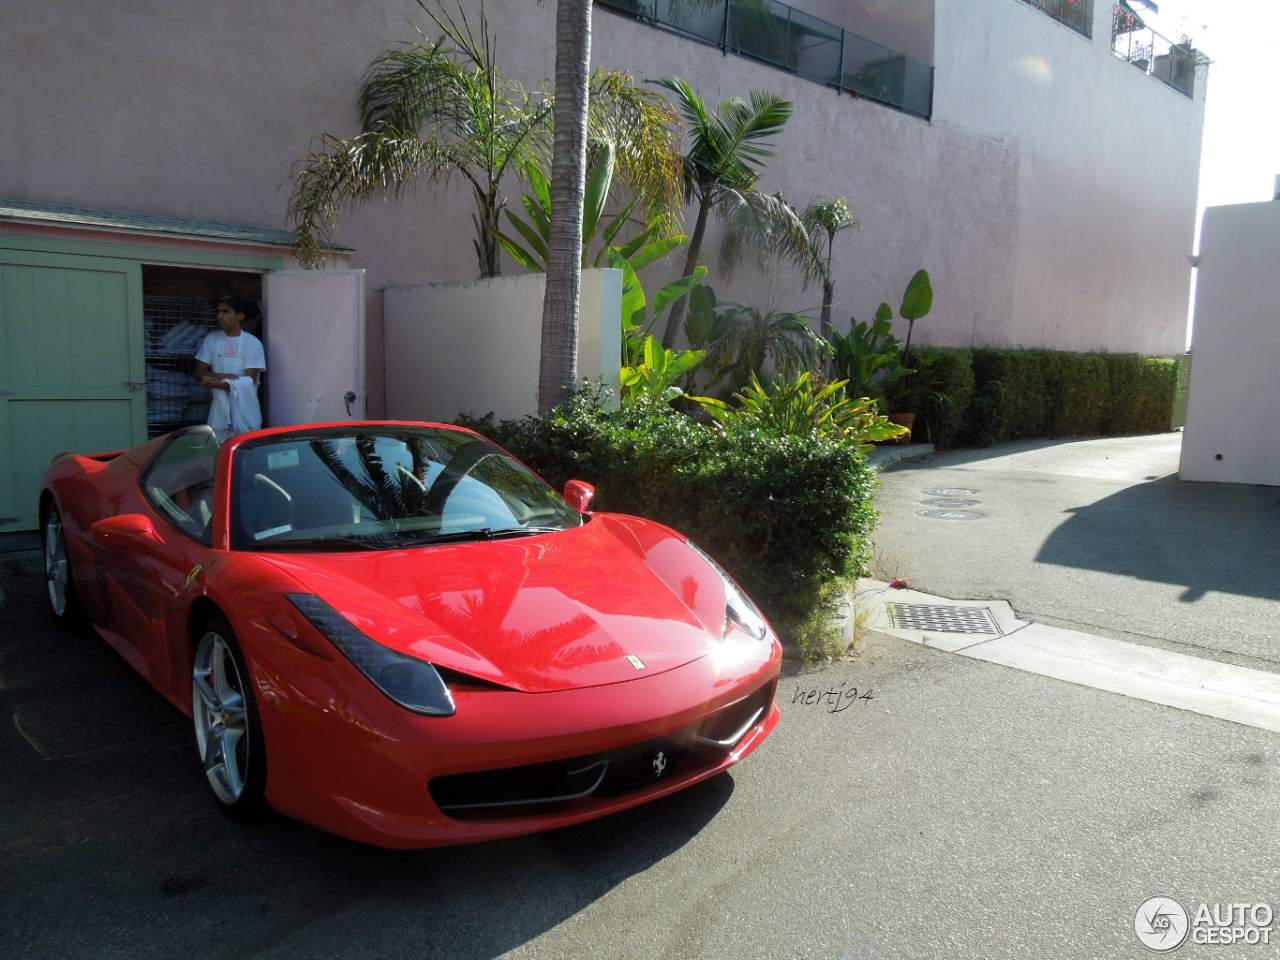 Ferrari 458 Spider 11 January 2014 Autogespot